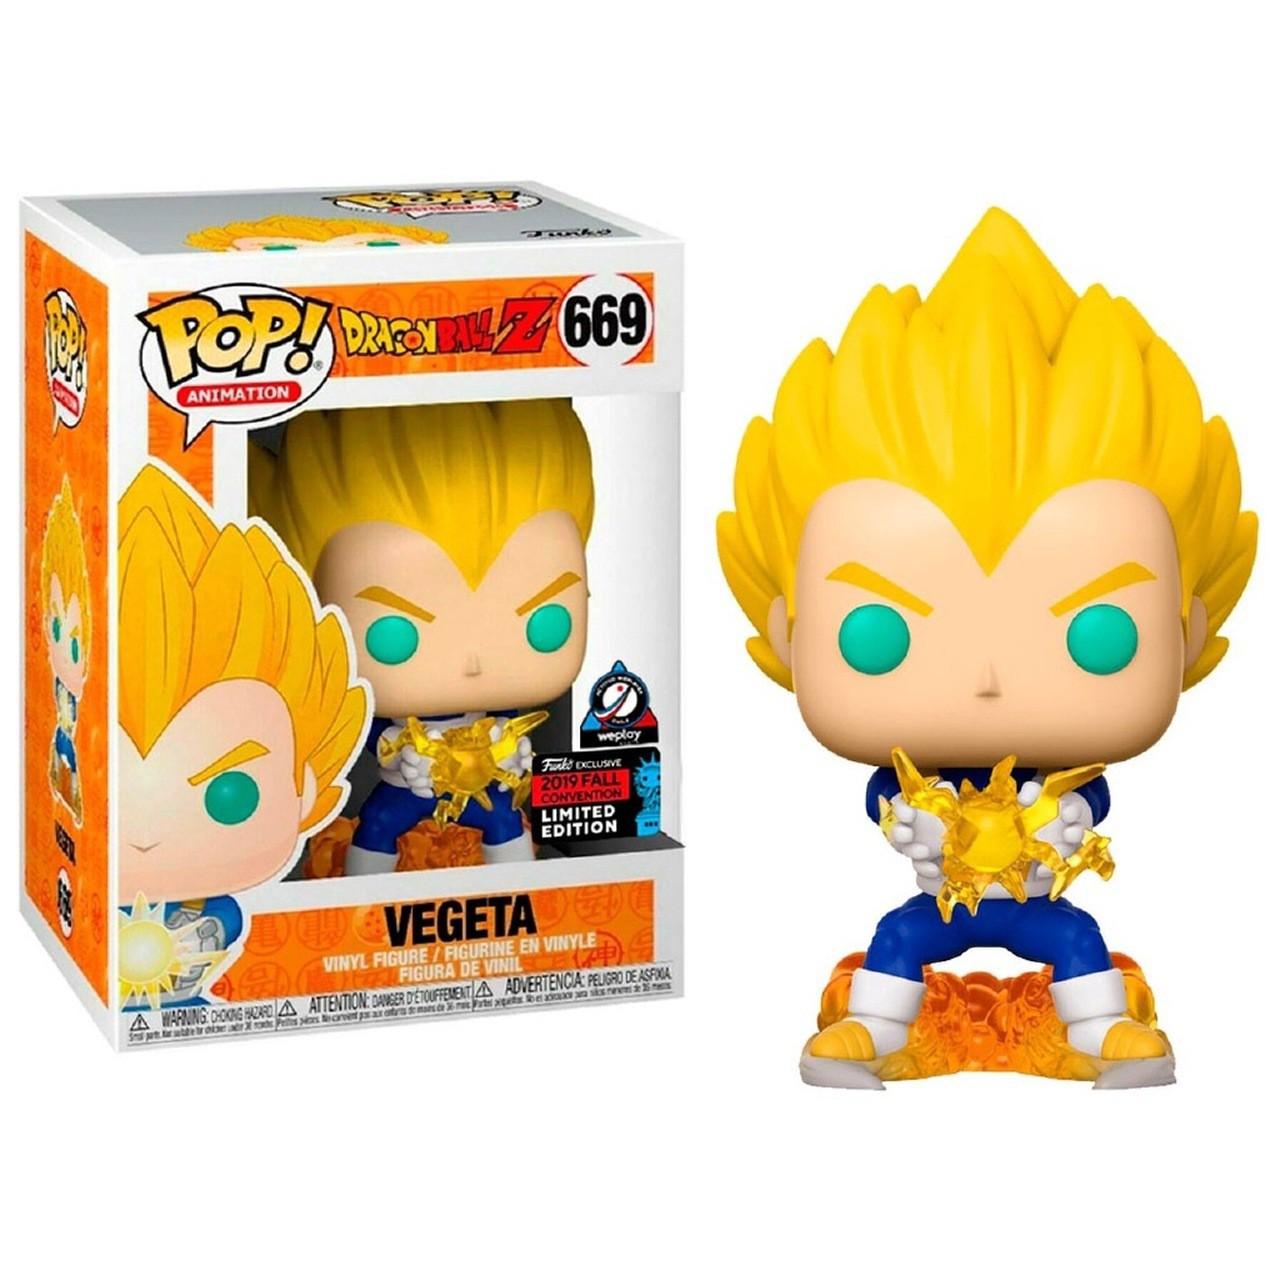 Boneco Funko Pop Vegeta Final Flash 669 Dragon Ball Limited